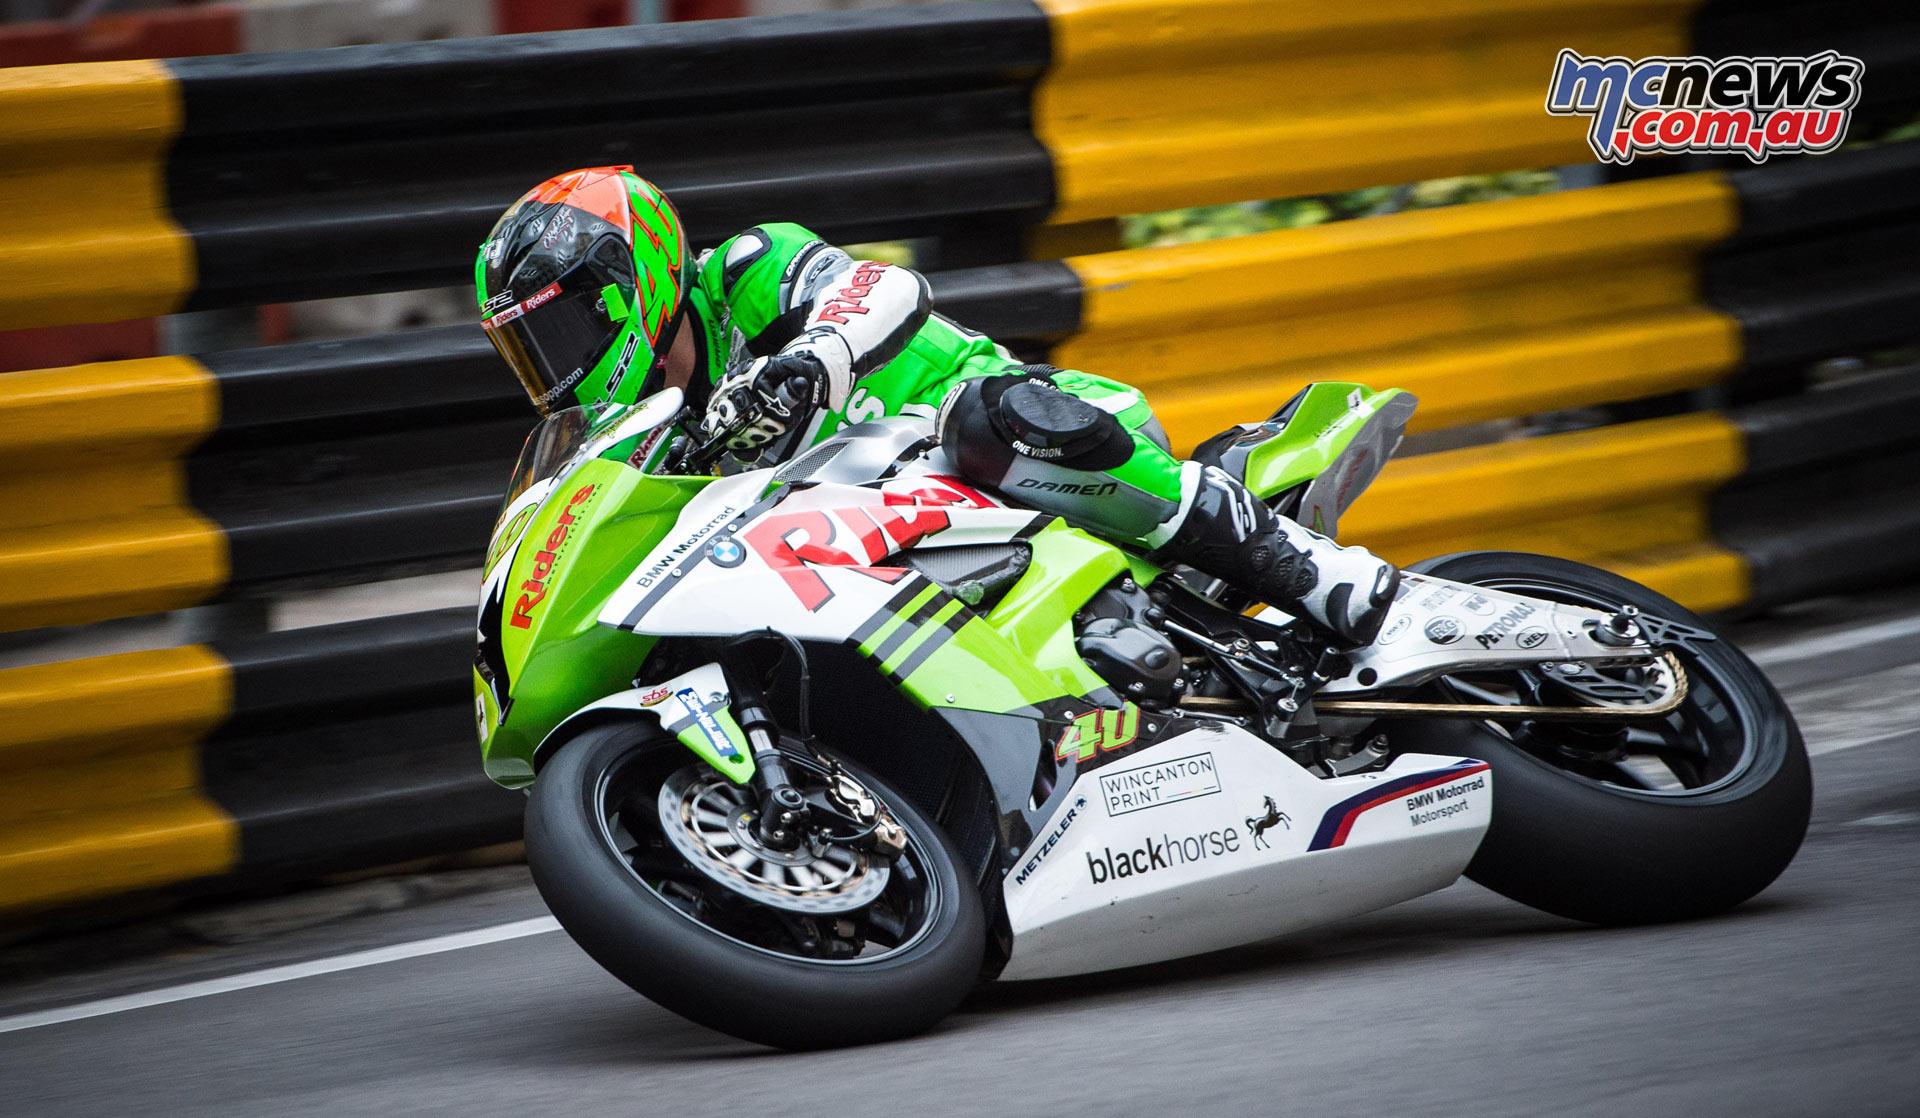 Hickman wins 2016 Macau Motorcycle GP | MCNews